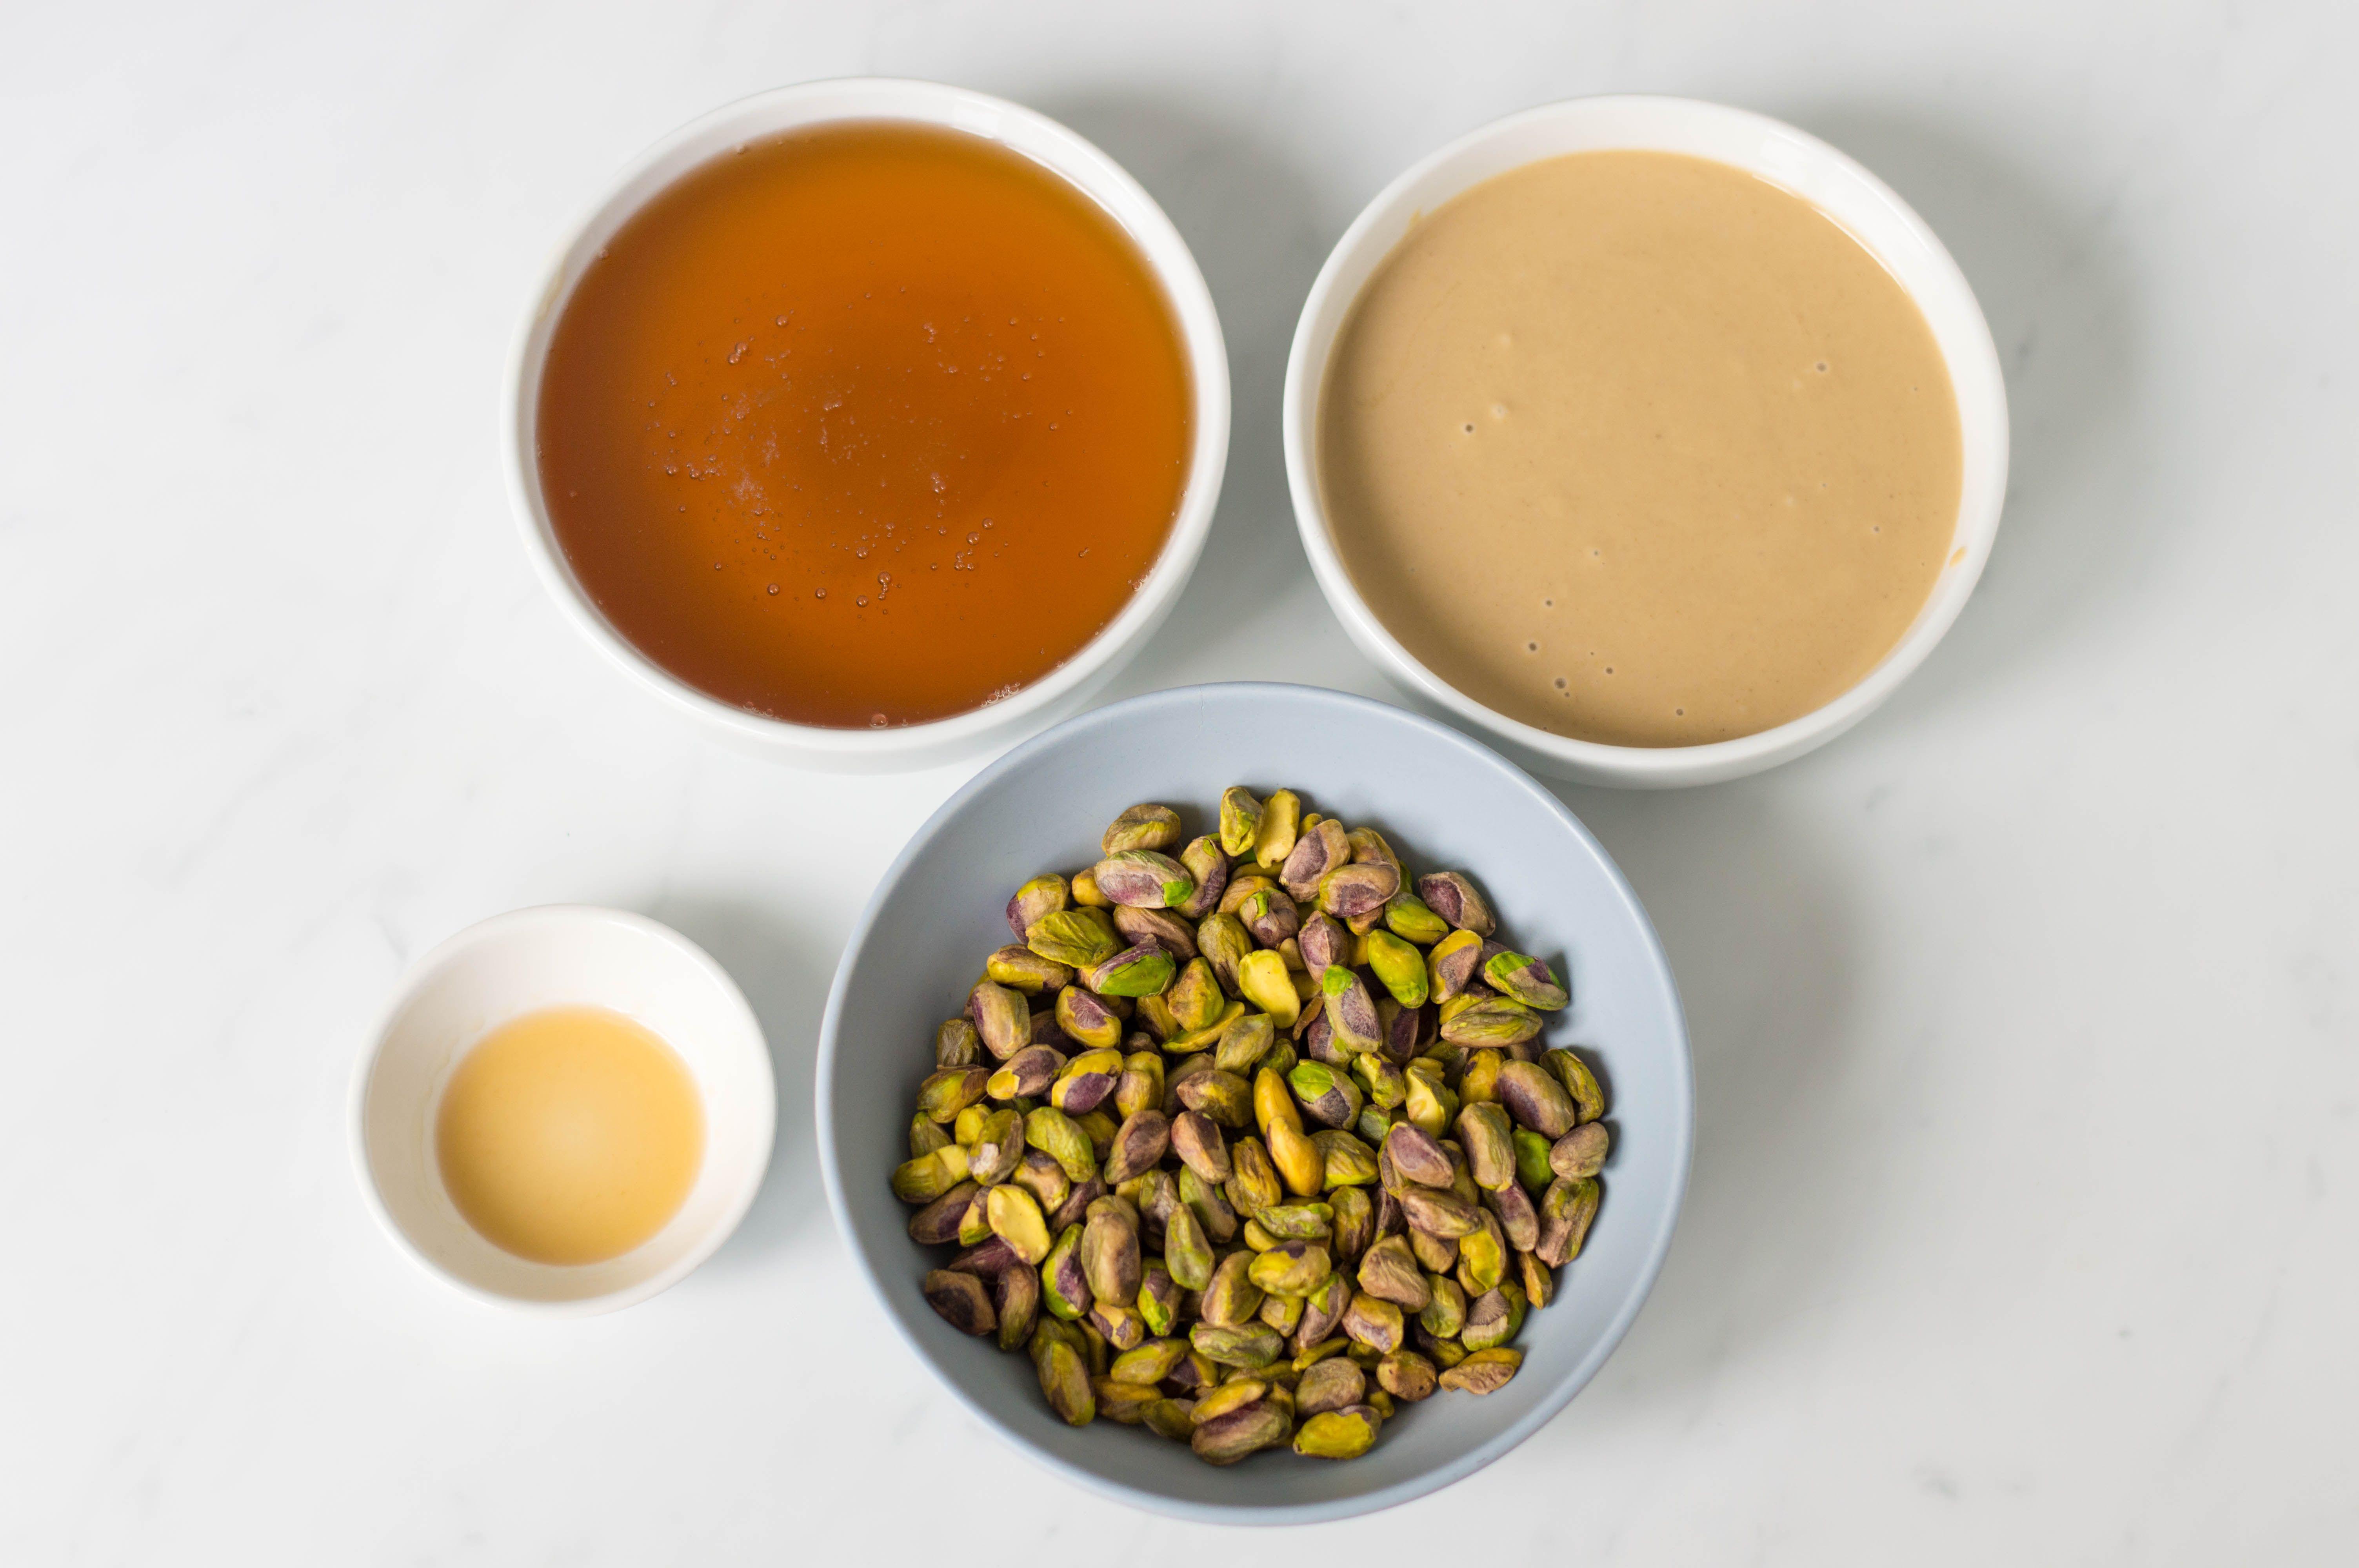 Sesame tahini halvah recipe ingredients